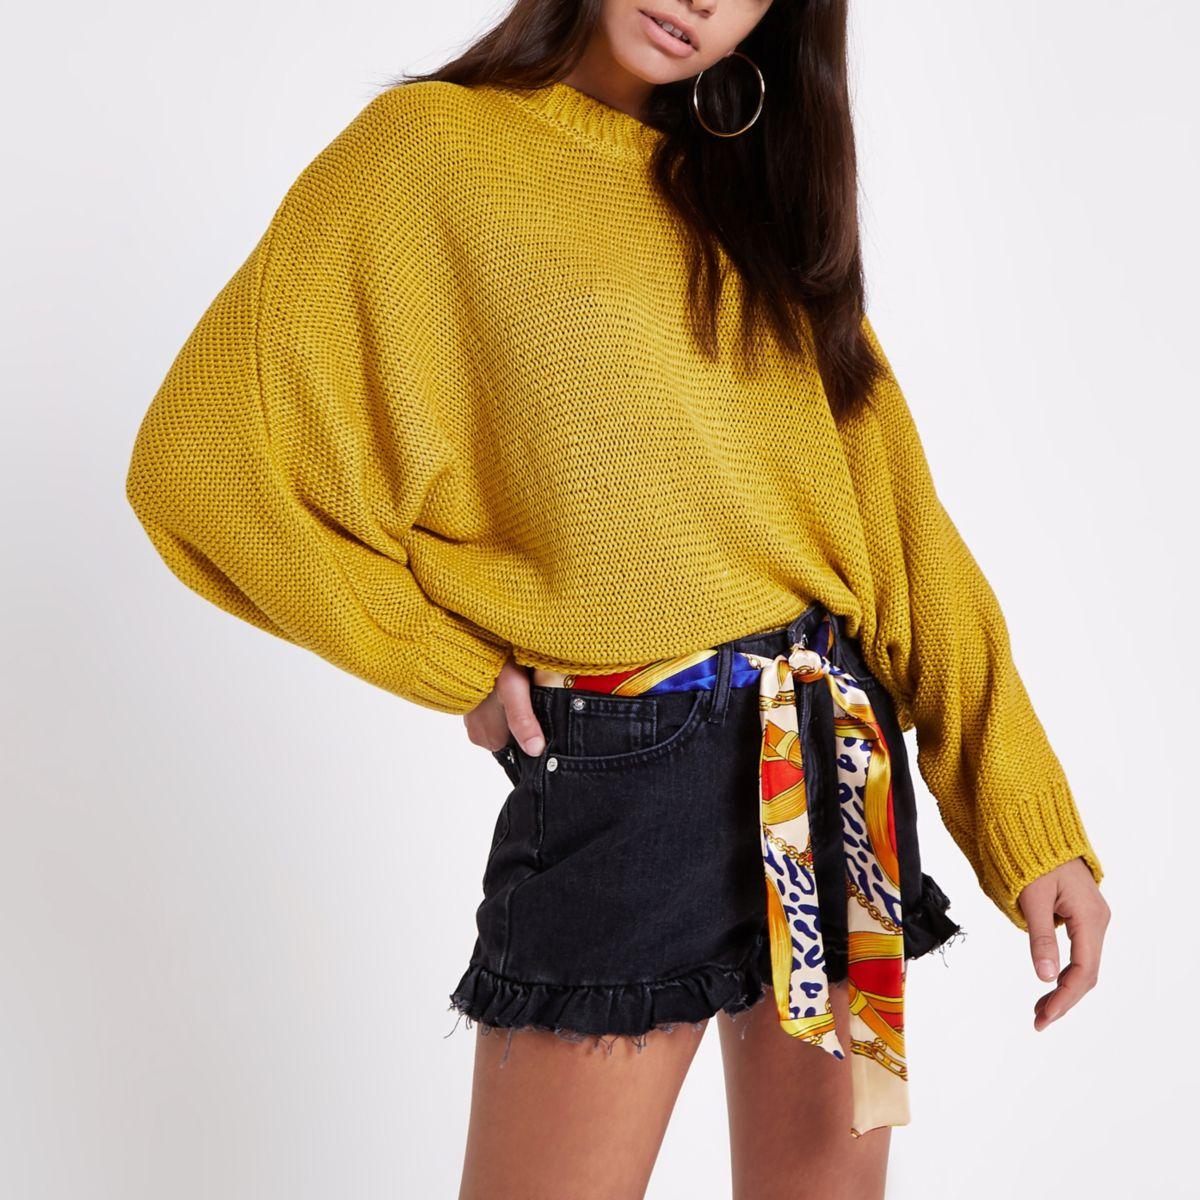 Yellow batwing sweater